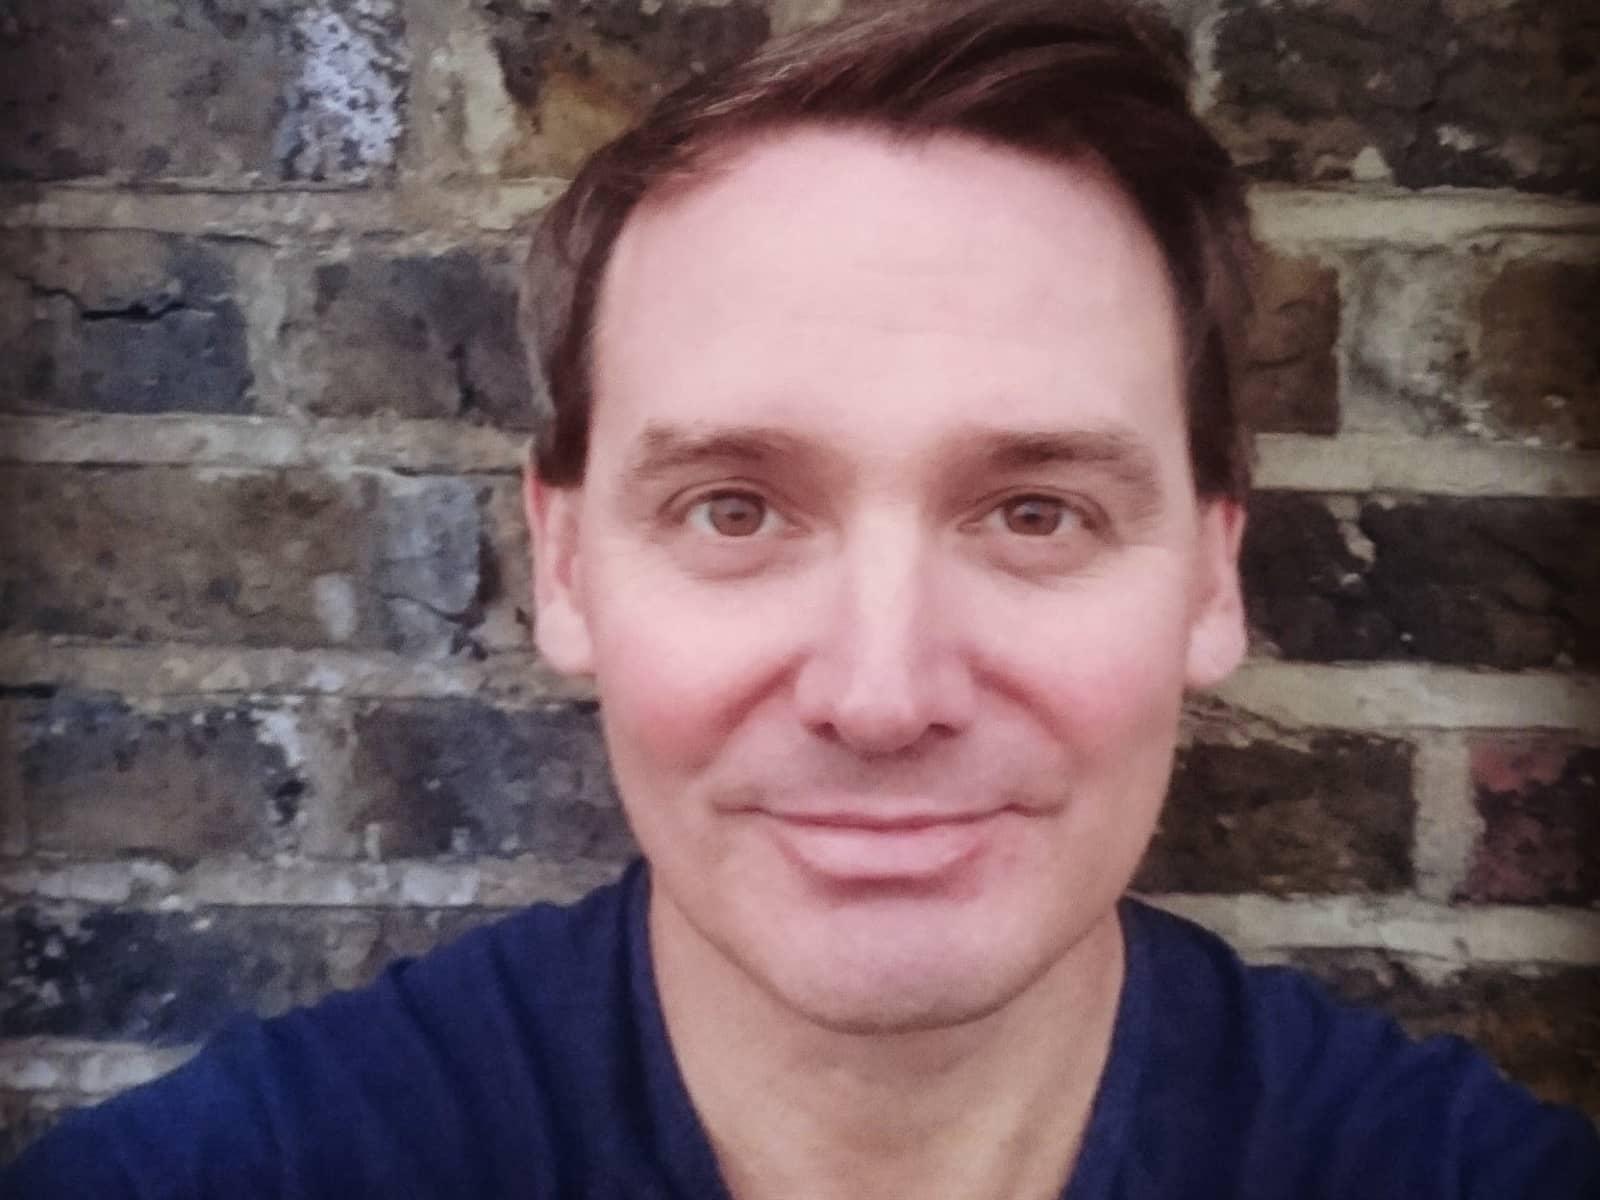 Adam from London, United Kingdom